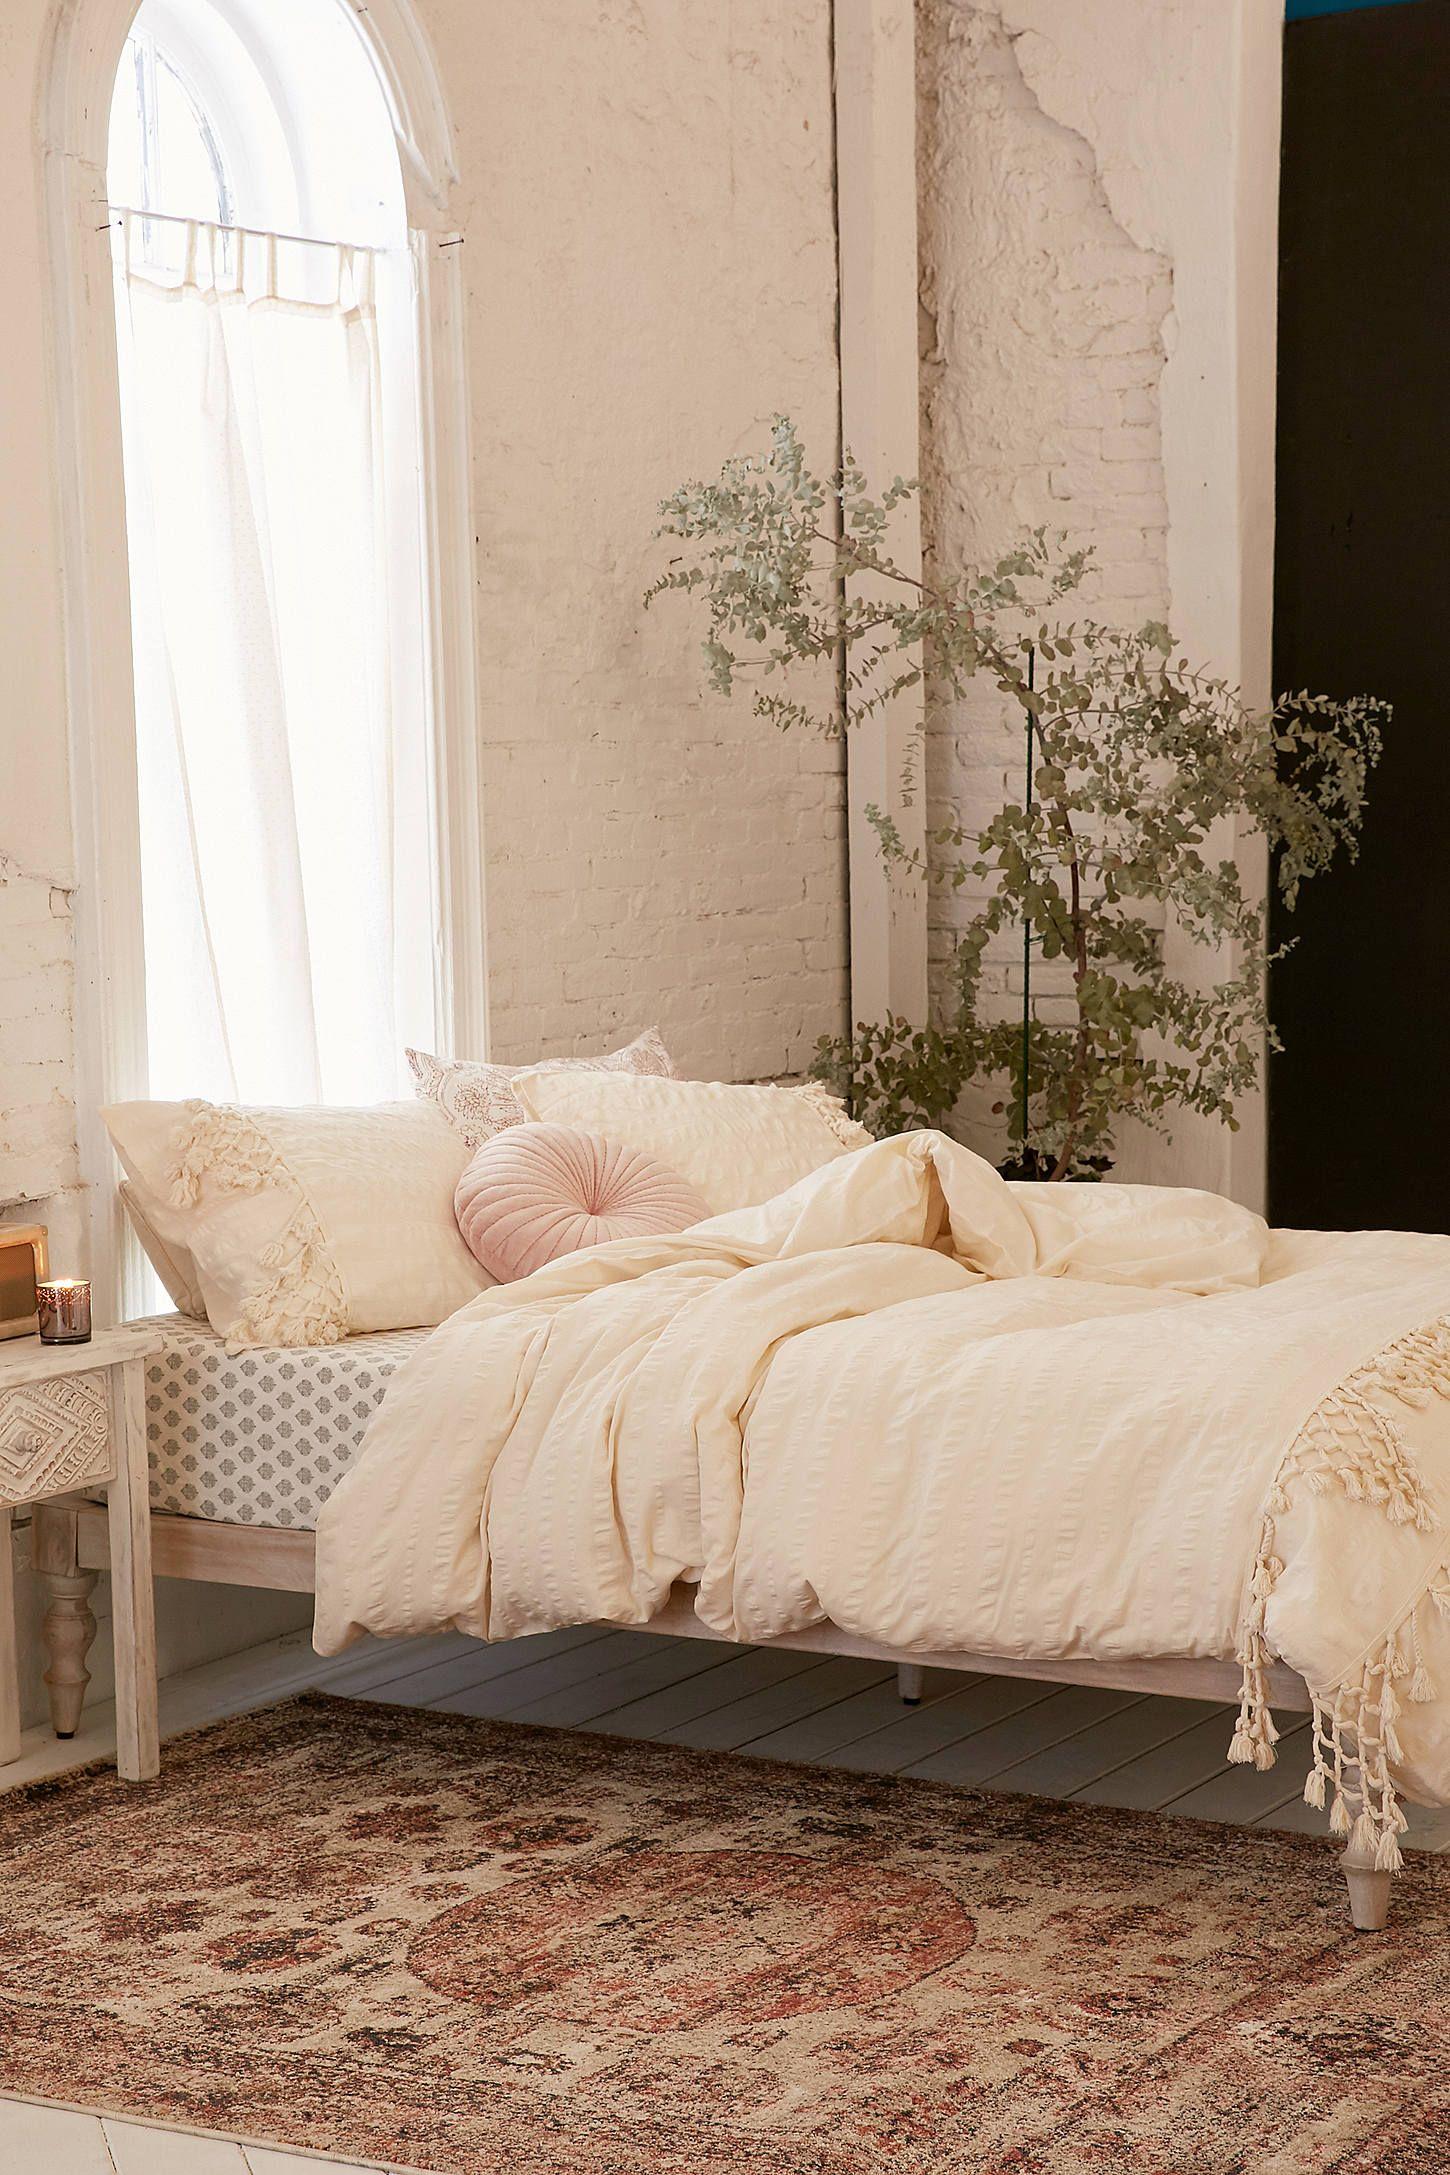 Xandra Trim Duvet Cover | Duvet, Bedrooms and Room